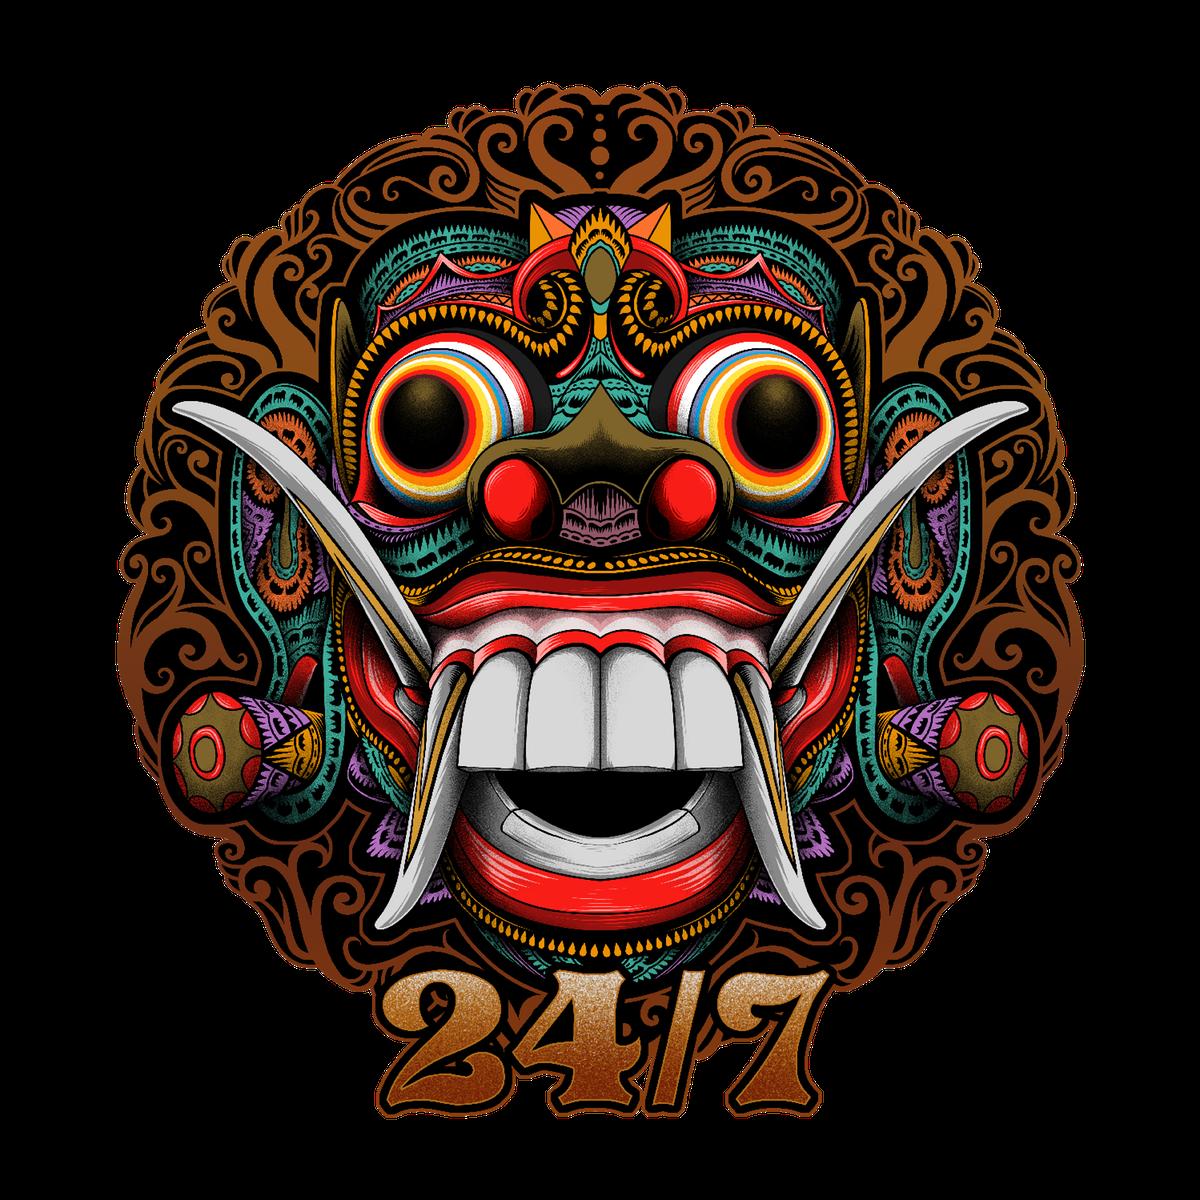 24/7 (Hip-Hop Producer)